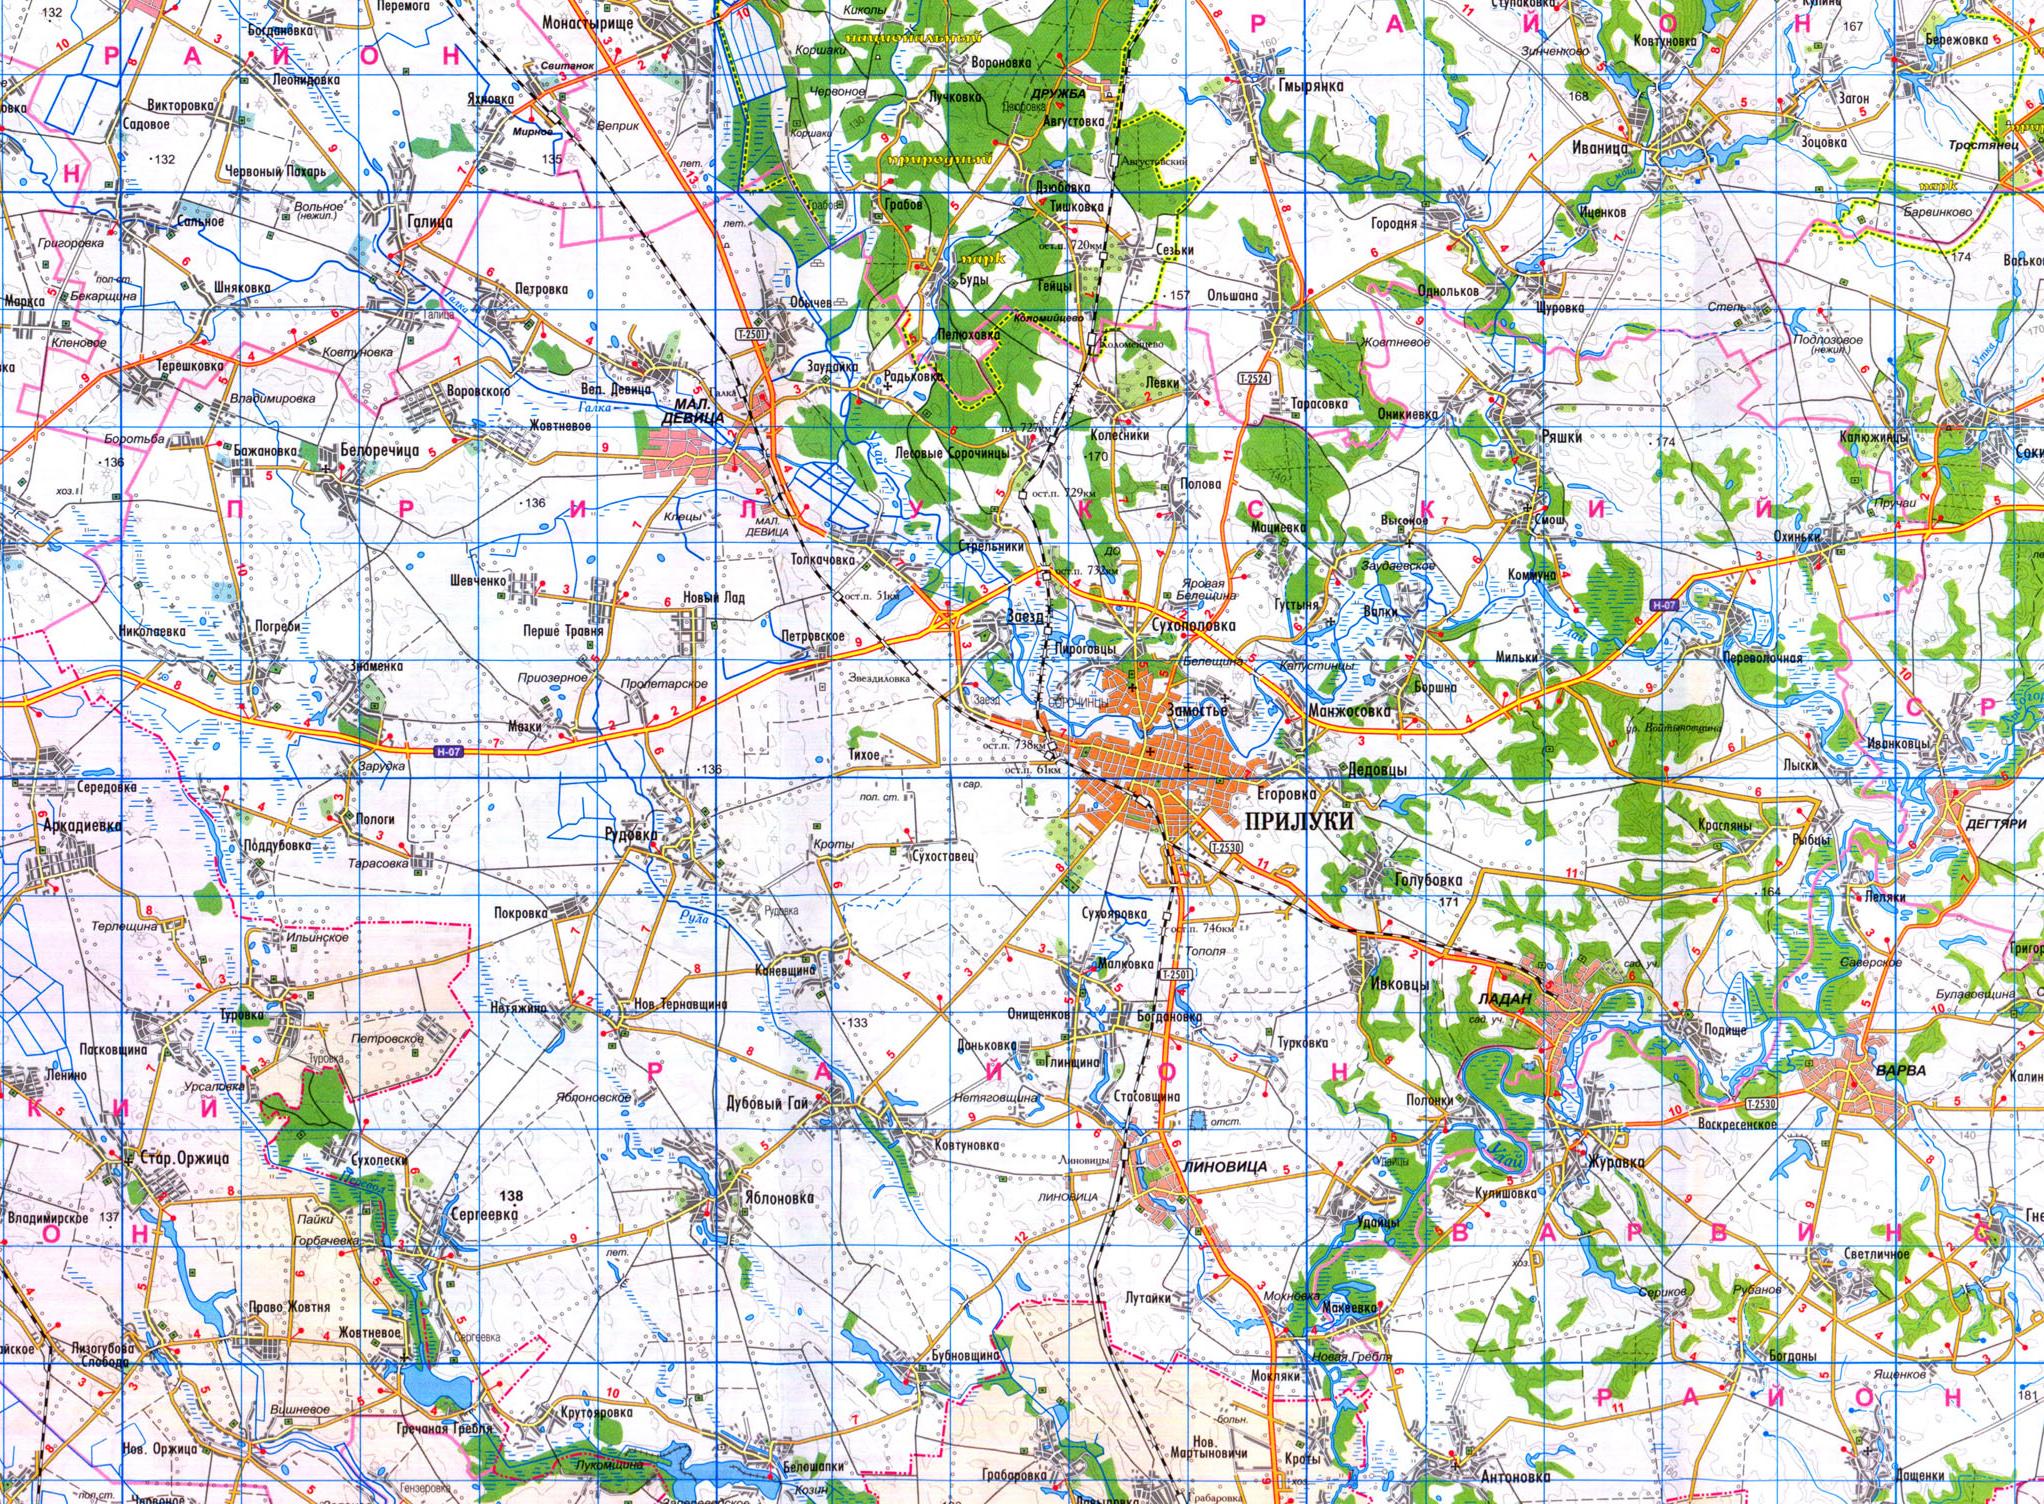 карта прилукского района: priluki.ukr1.ru/index.php?file=maprn